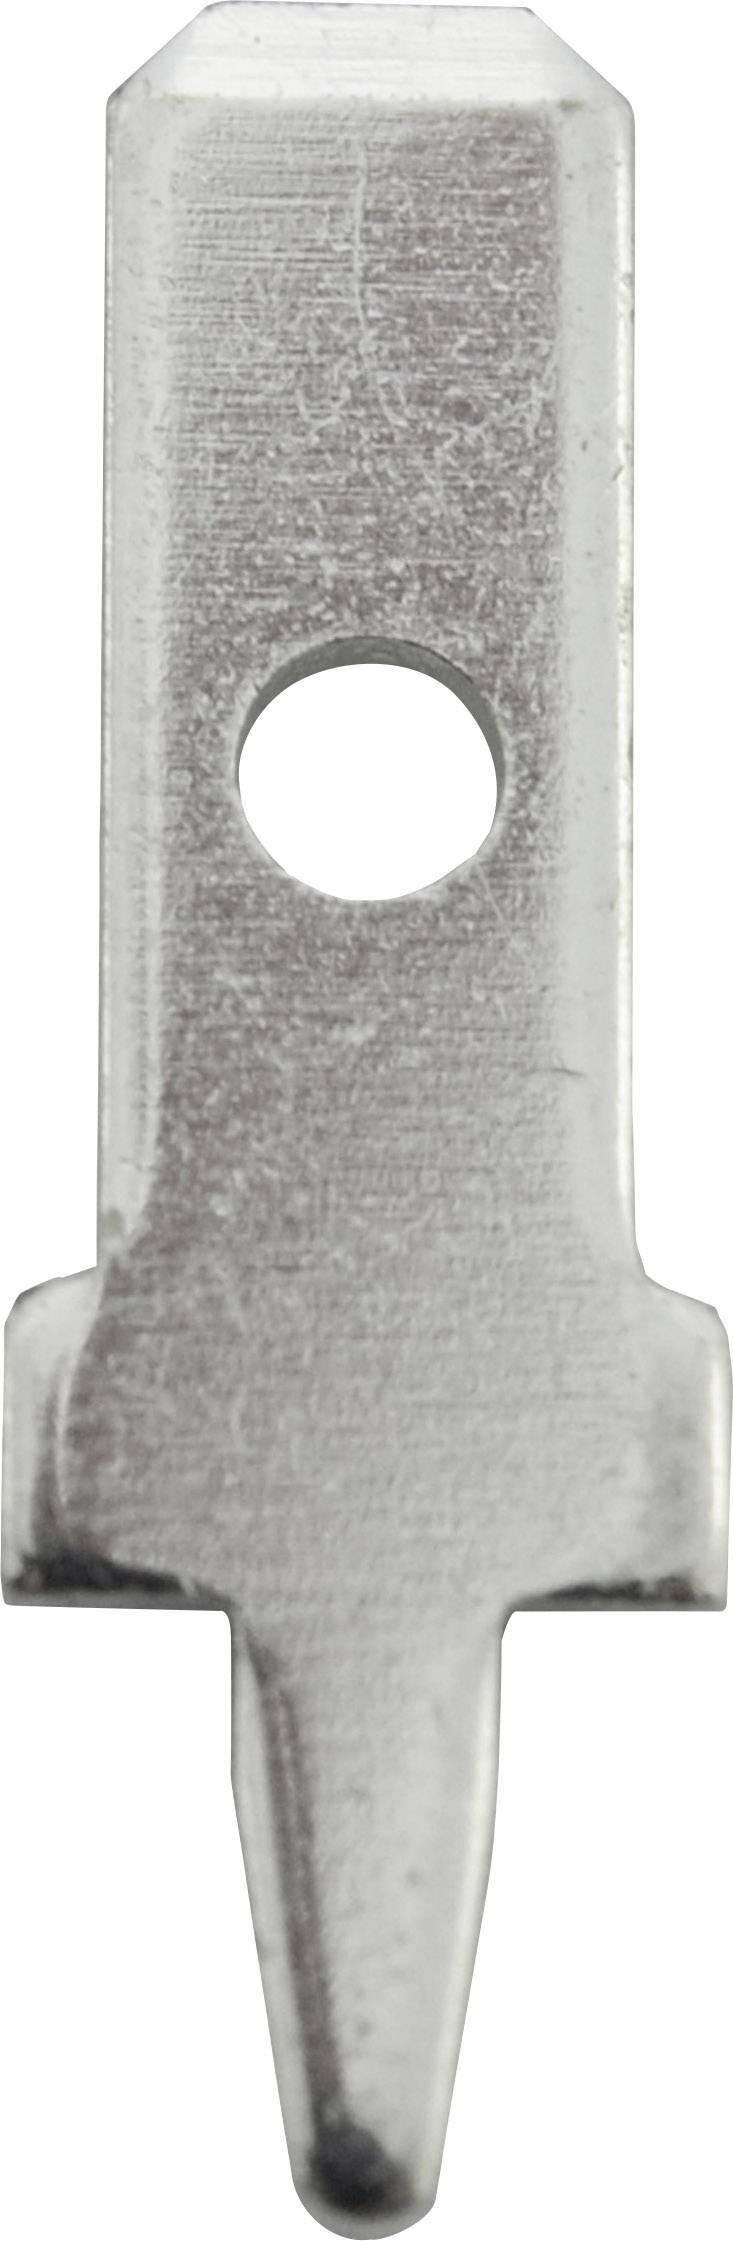 Faston zástrčka Vogt Verbindungstechnik 3775l08.28 2.8 mm x 0.8 mm, 180 °, bez izolace, kov, 100 ks